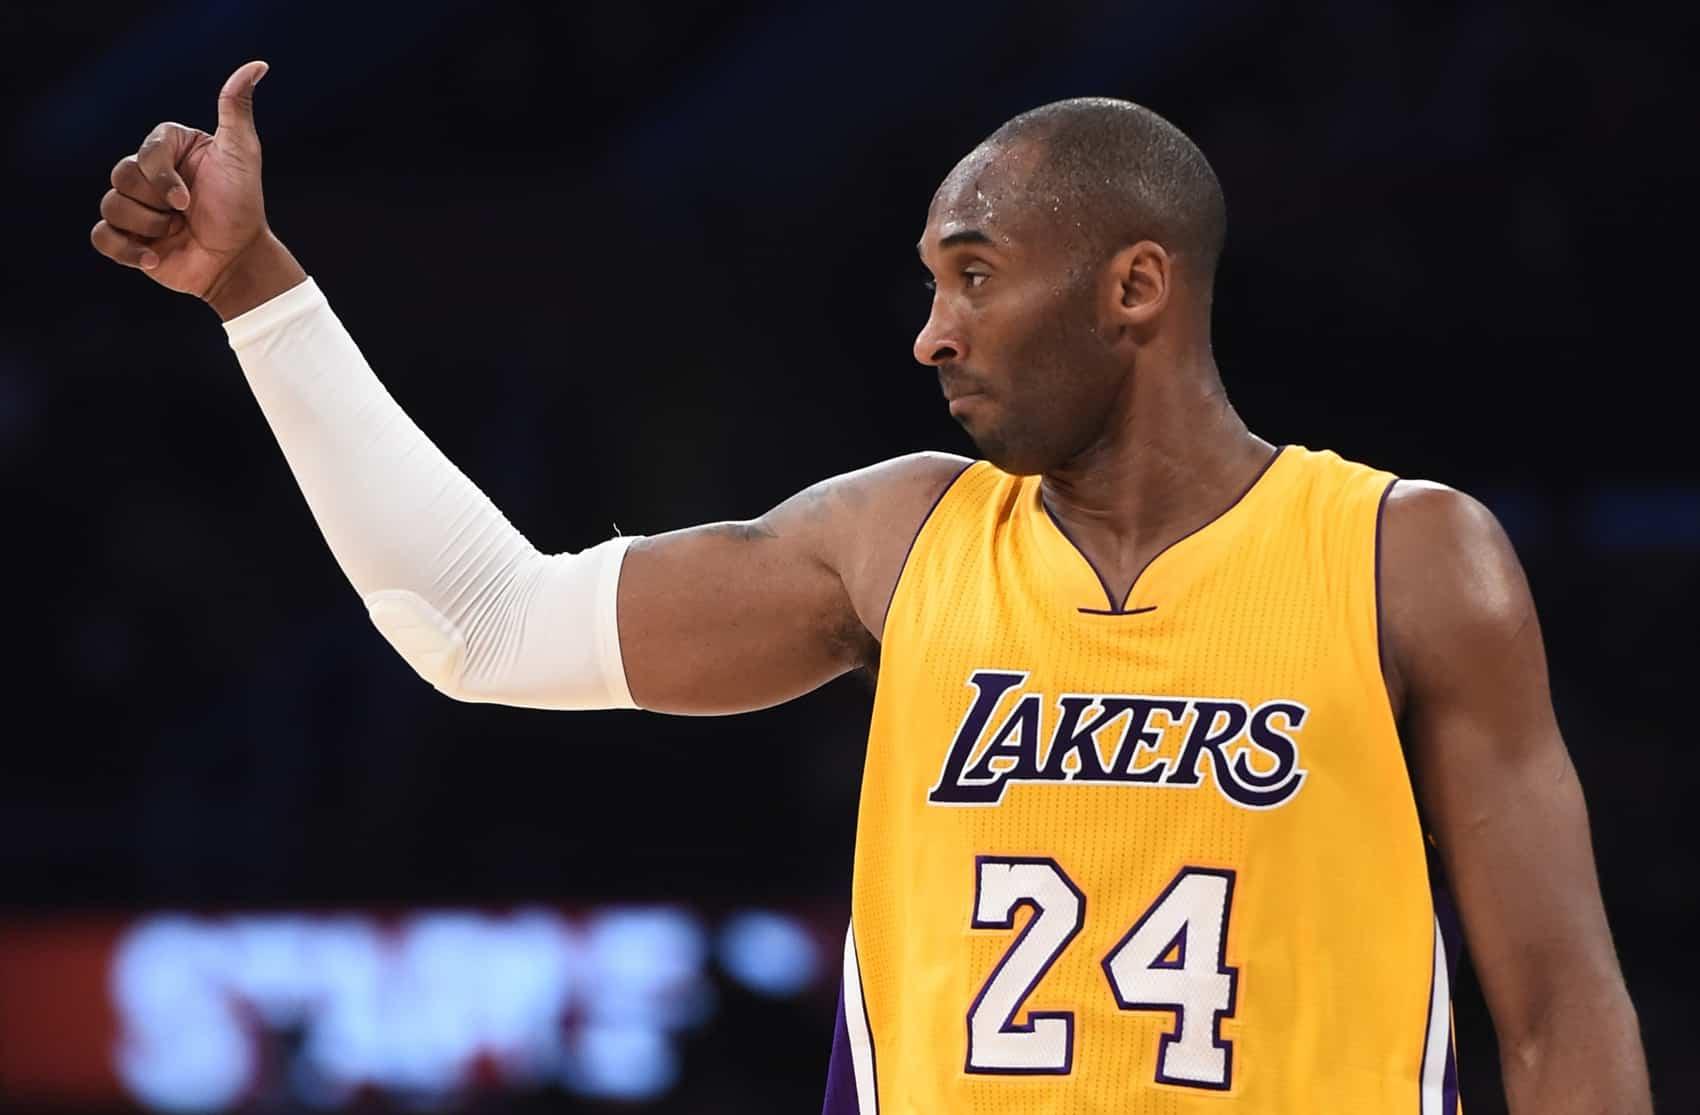 Kobe Bryant of the Los Angeles Lakers.